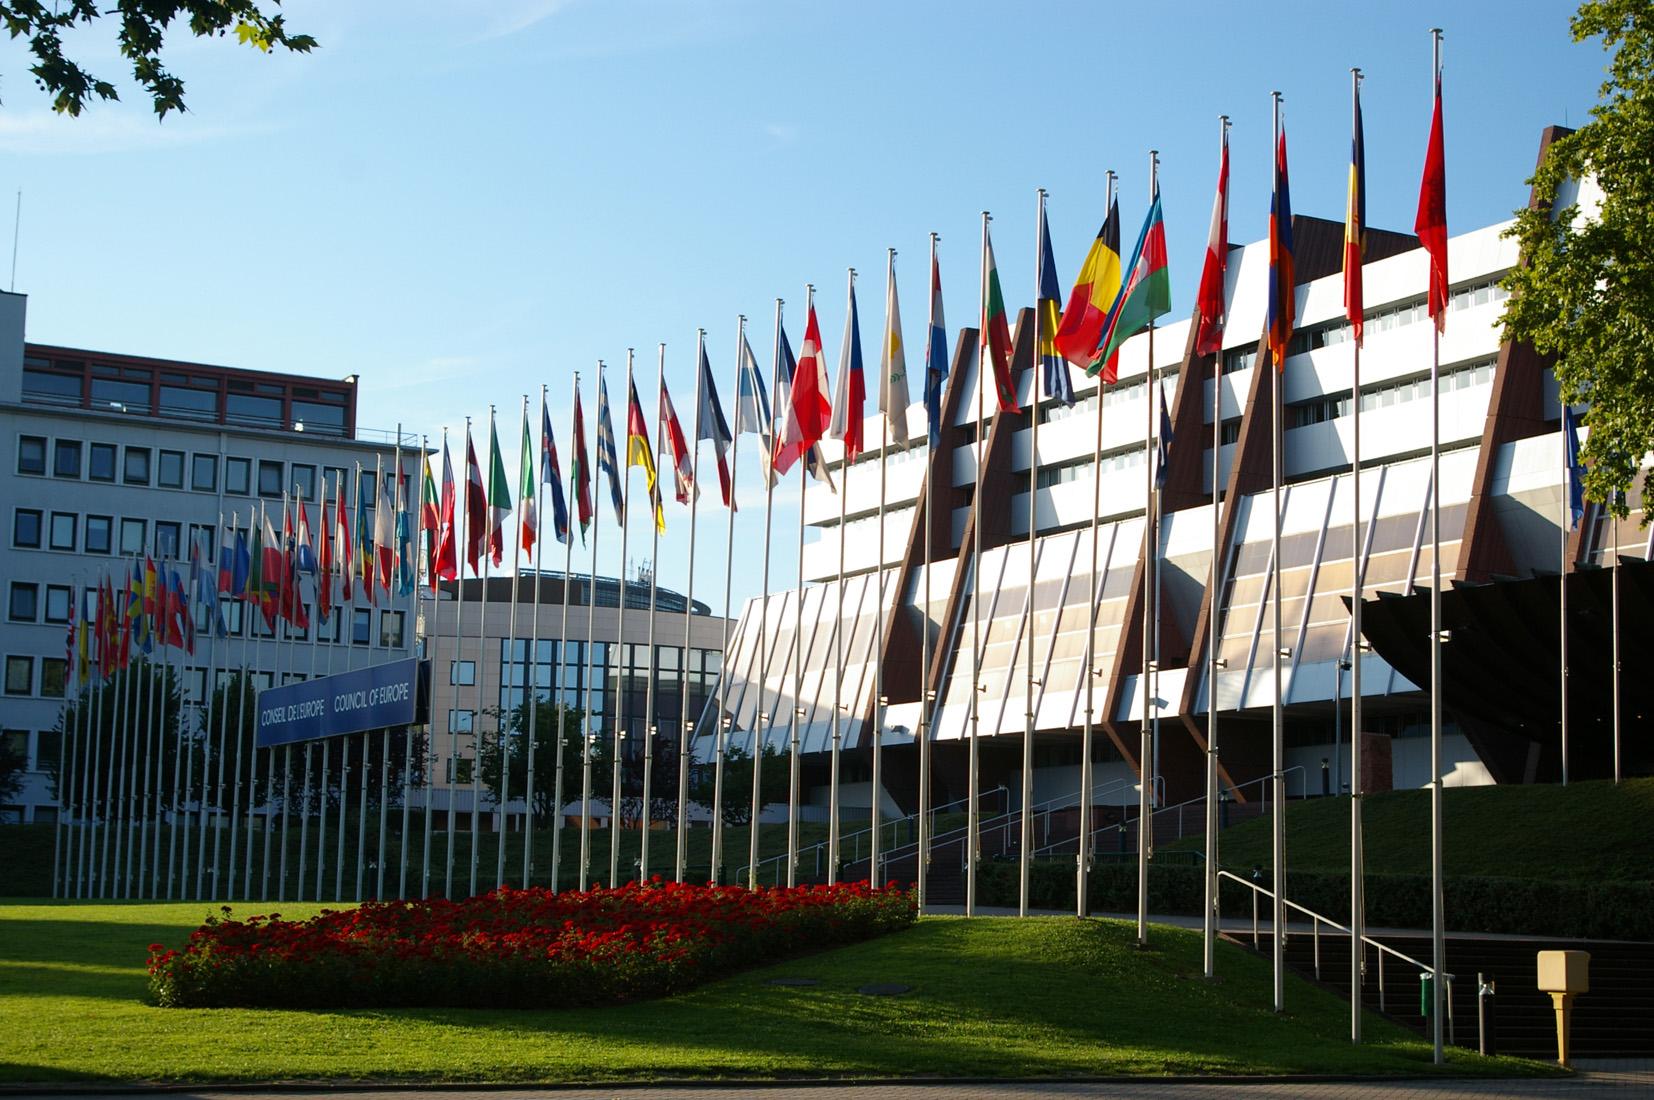 Concil of Europe, Alsace, Alsacia, Country, Drapeau, HQ Photo